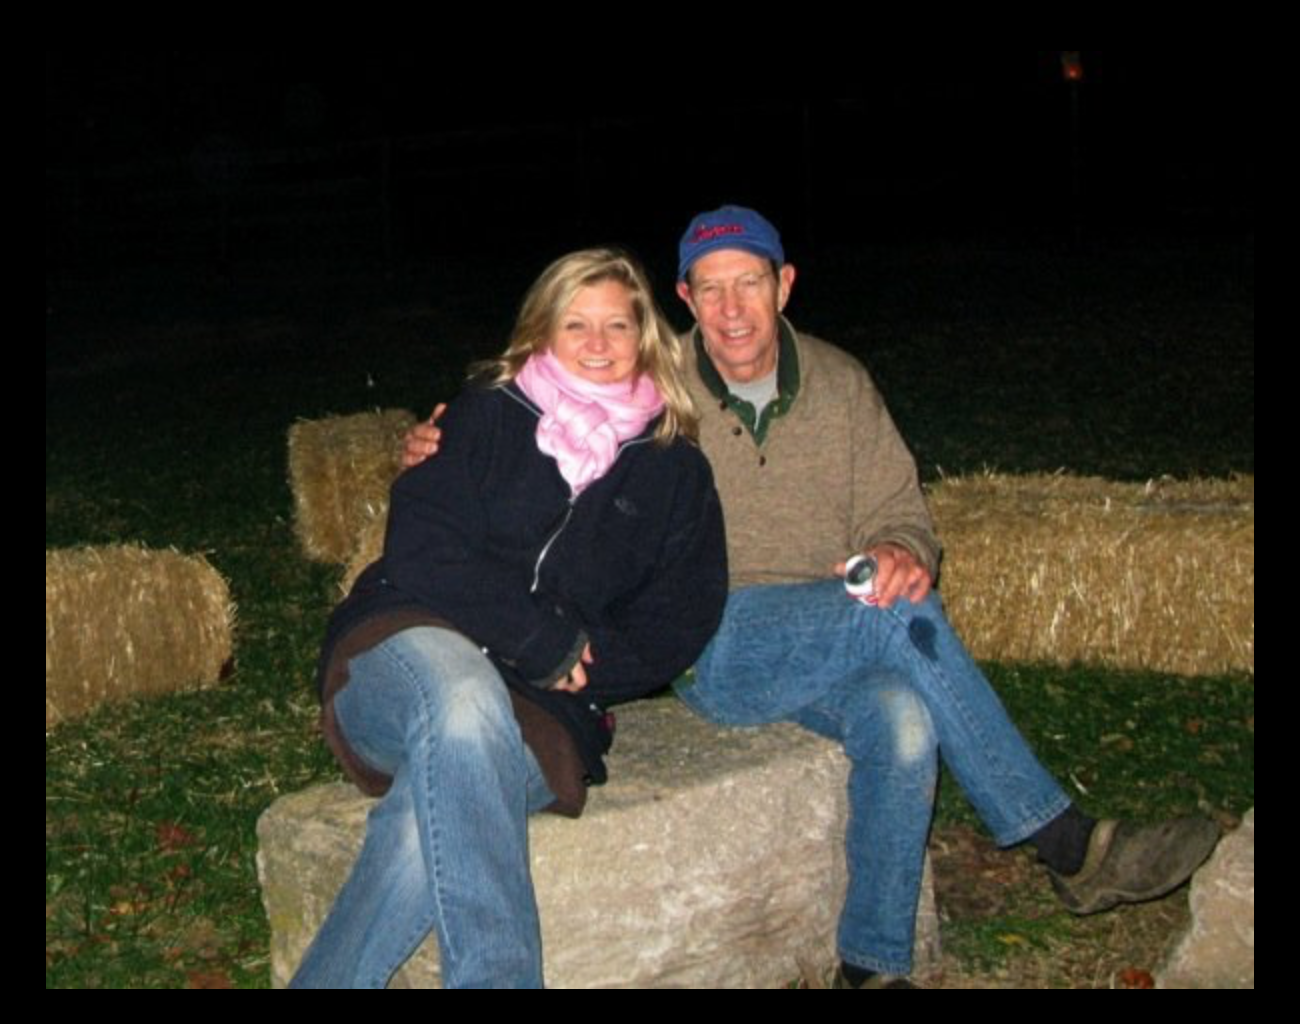 Grateful to  see Paul at this bonfire at Doug's.